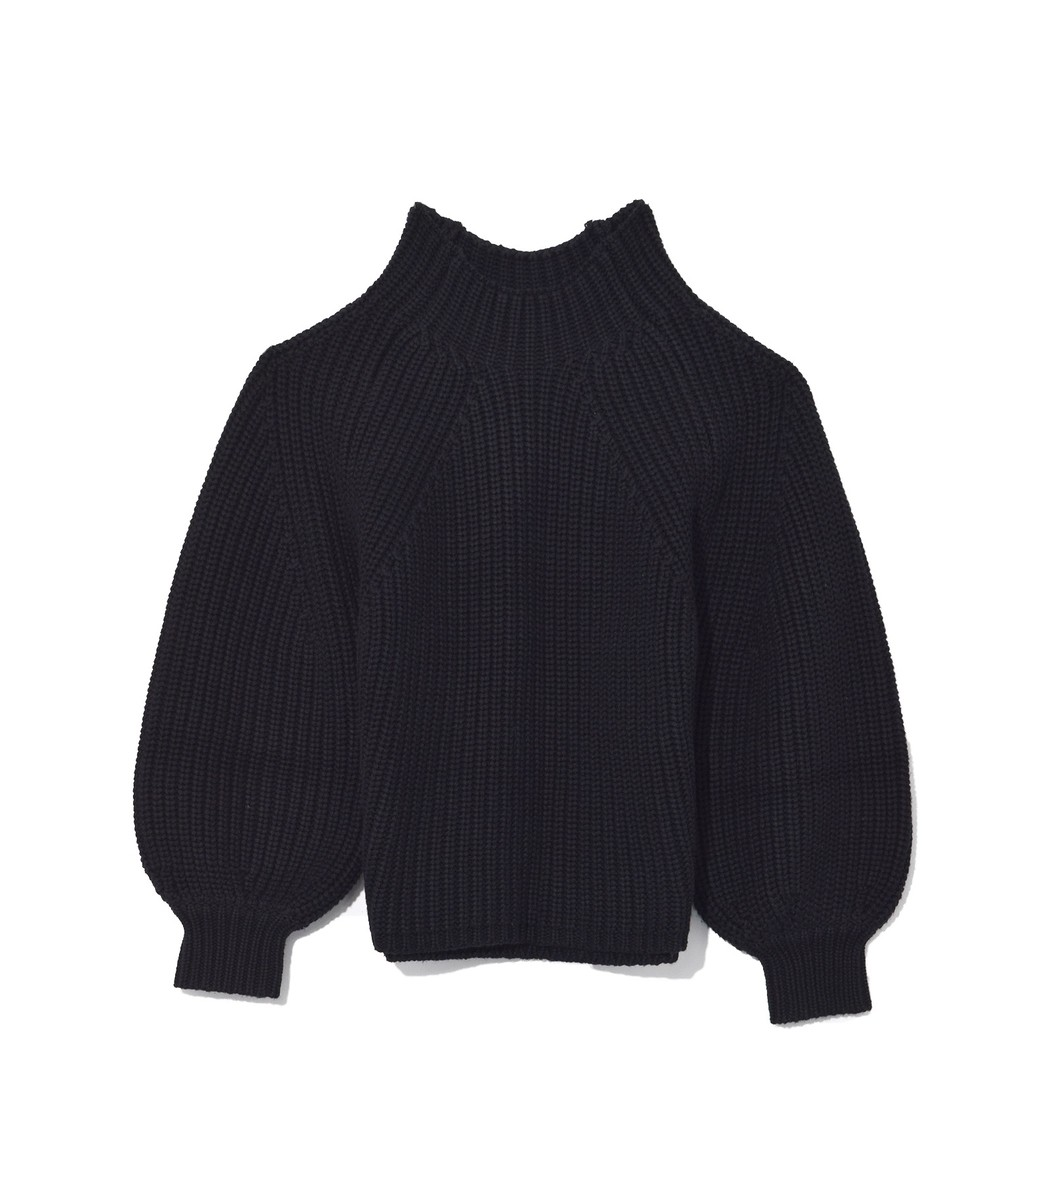 APIECE APART Merel Funnel Neck Crop Sweater in Black